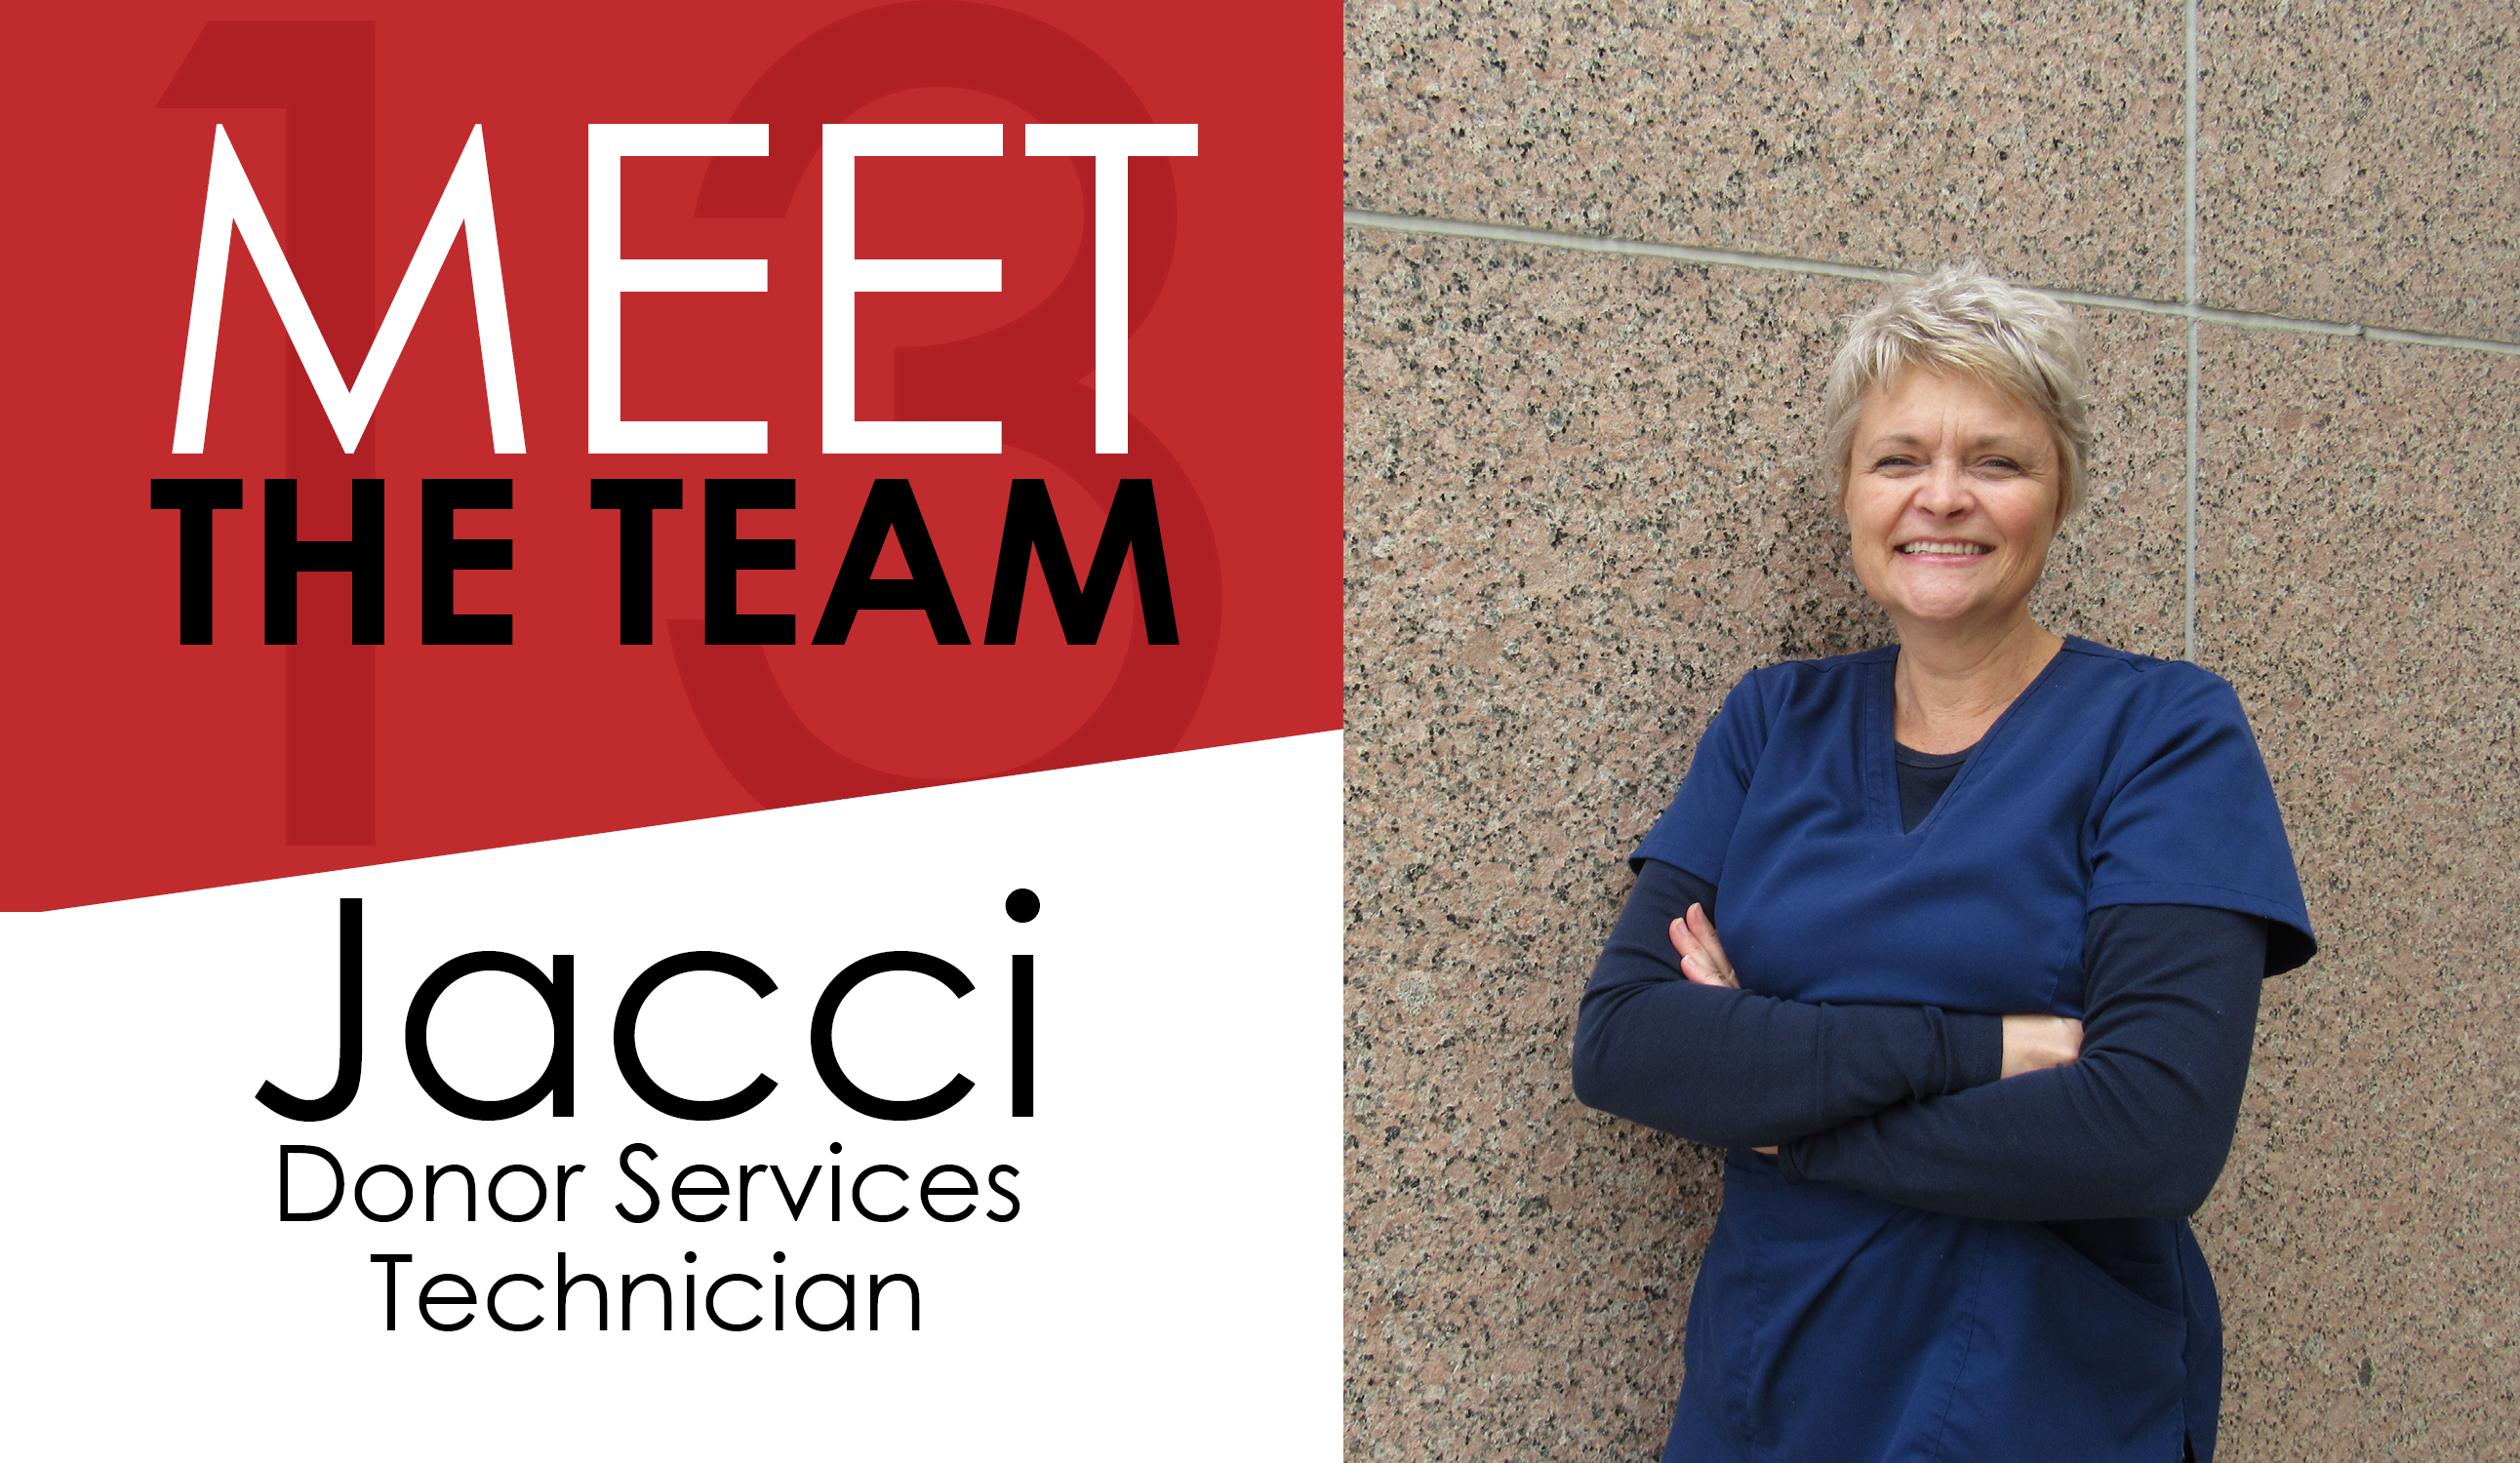 Meet the team - Jacci